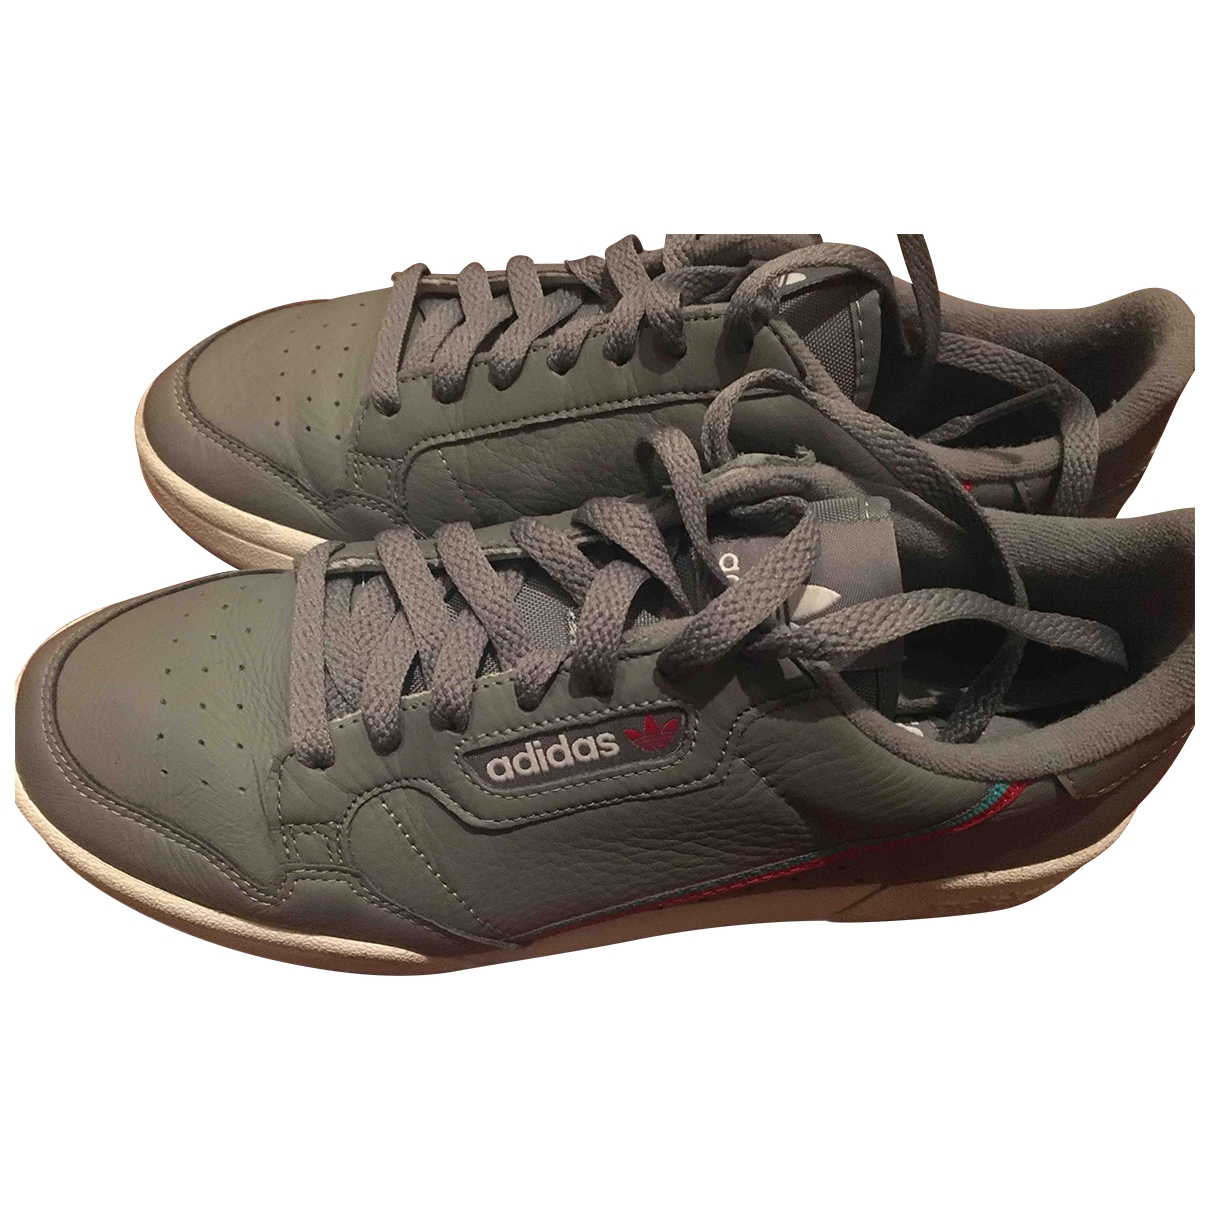 Adidas Continental 80 Sneakers in  Grau Leder